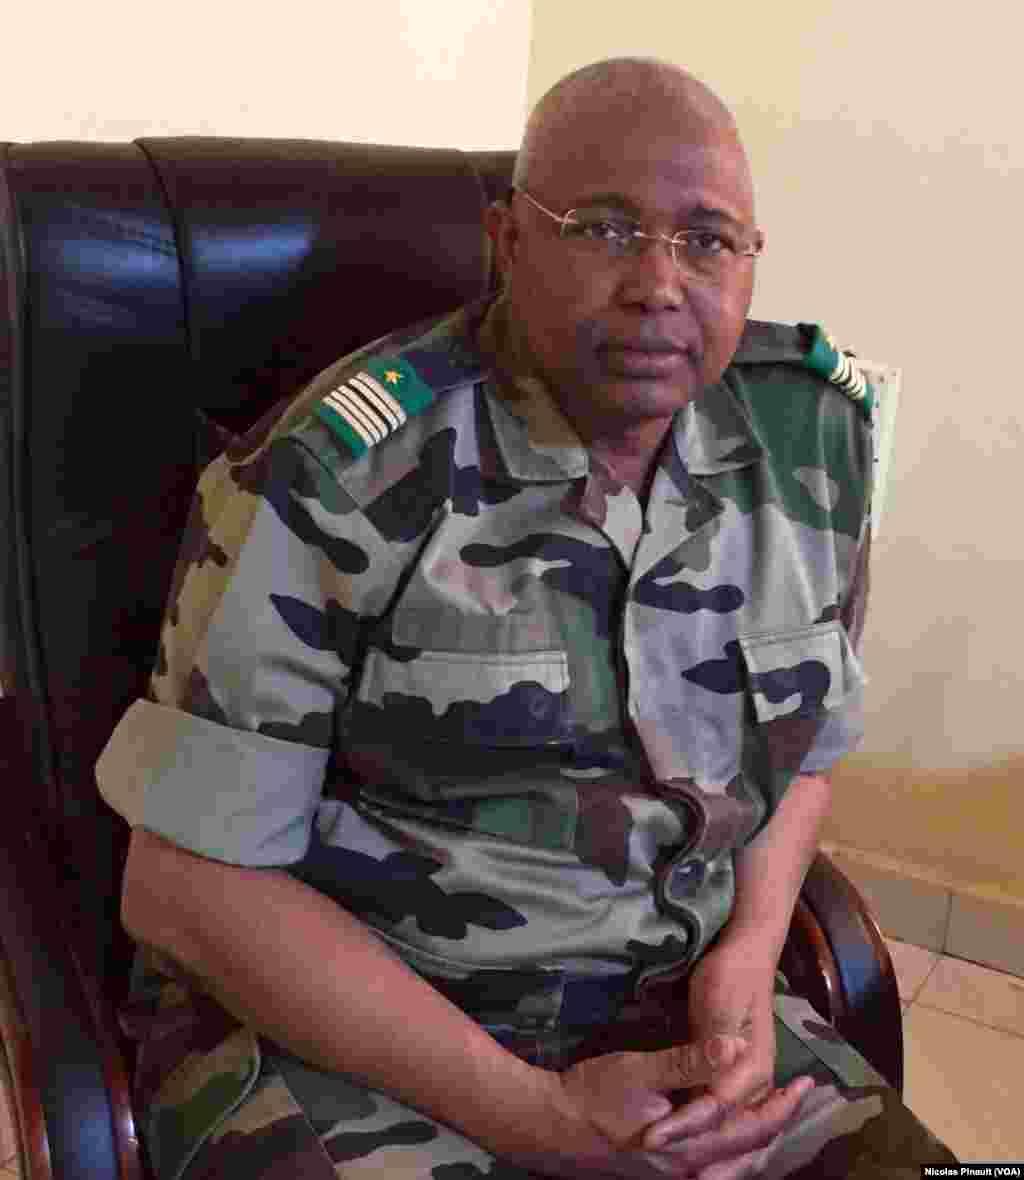 Colonel major Abdou Sidikou Issa, chef d'état-major adjoint de l'armée de terre à Diffa, le 1er mars 2016. (VOA/Nicolas Pinault)